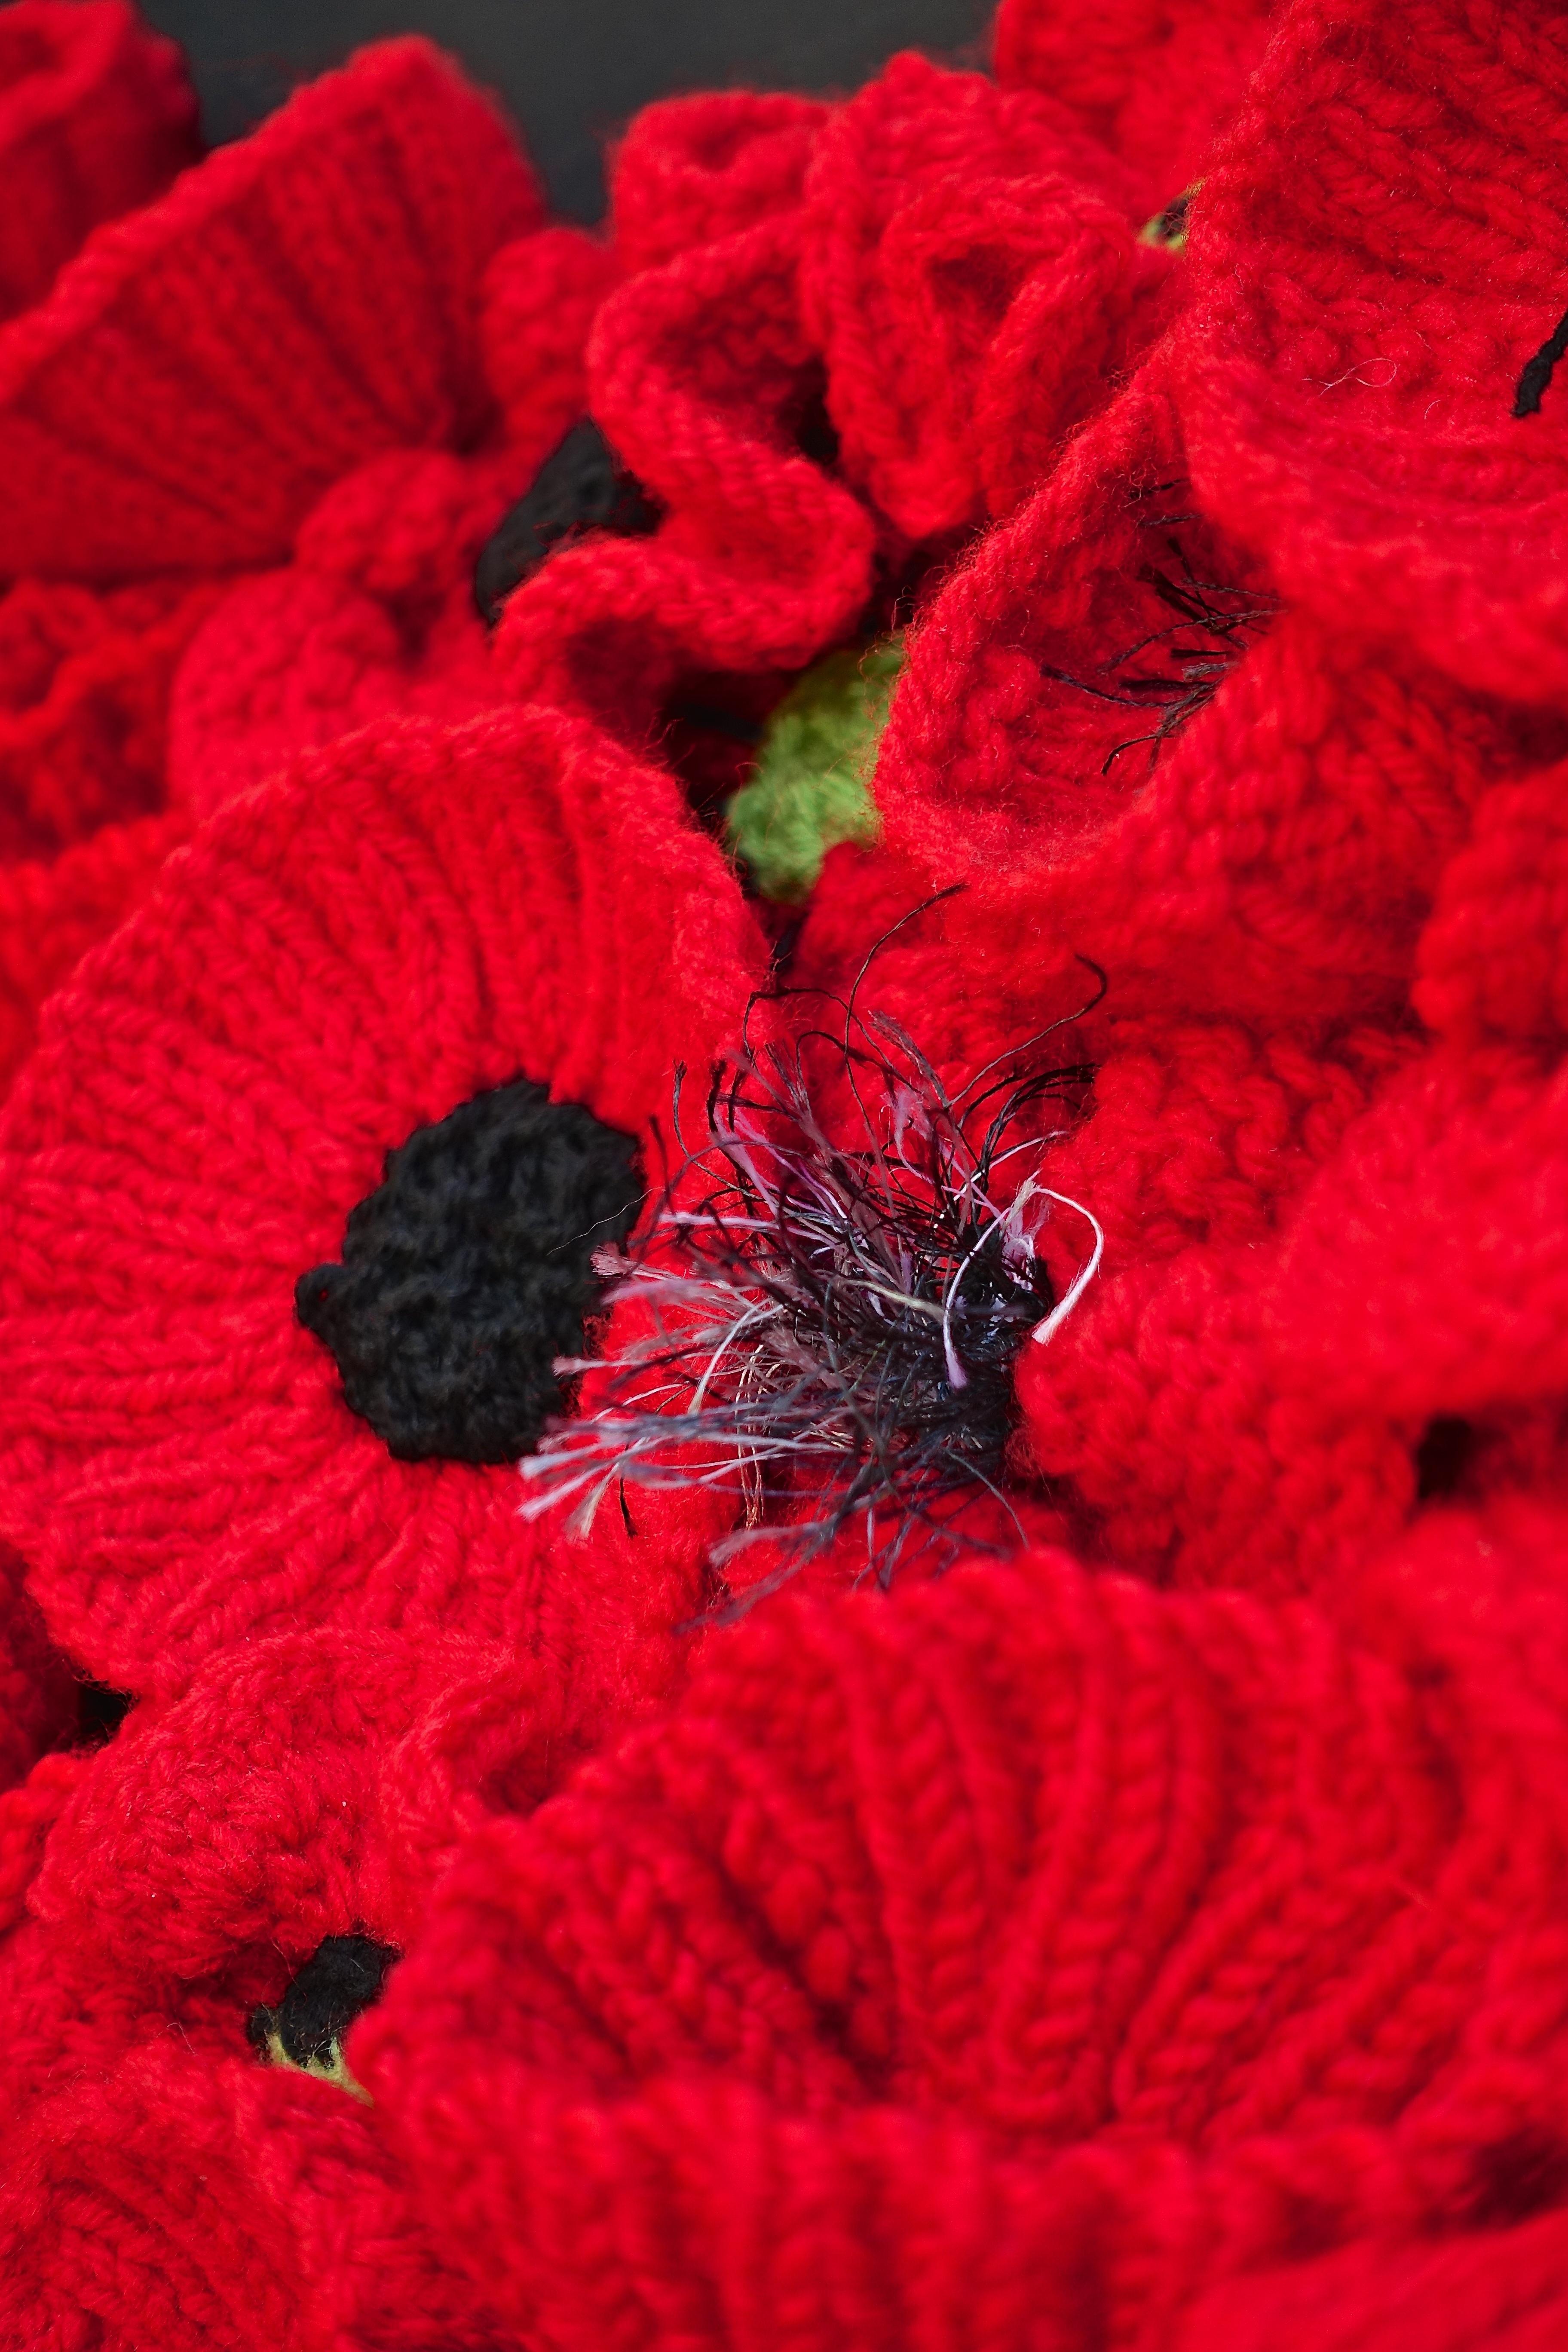 Free images leaf flower petal bloom pattern red flowers plant leaf flower petal bloom pattern red flowers crochet art design poppy knitted poppies macro photography izmirmasajfo